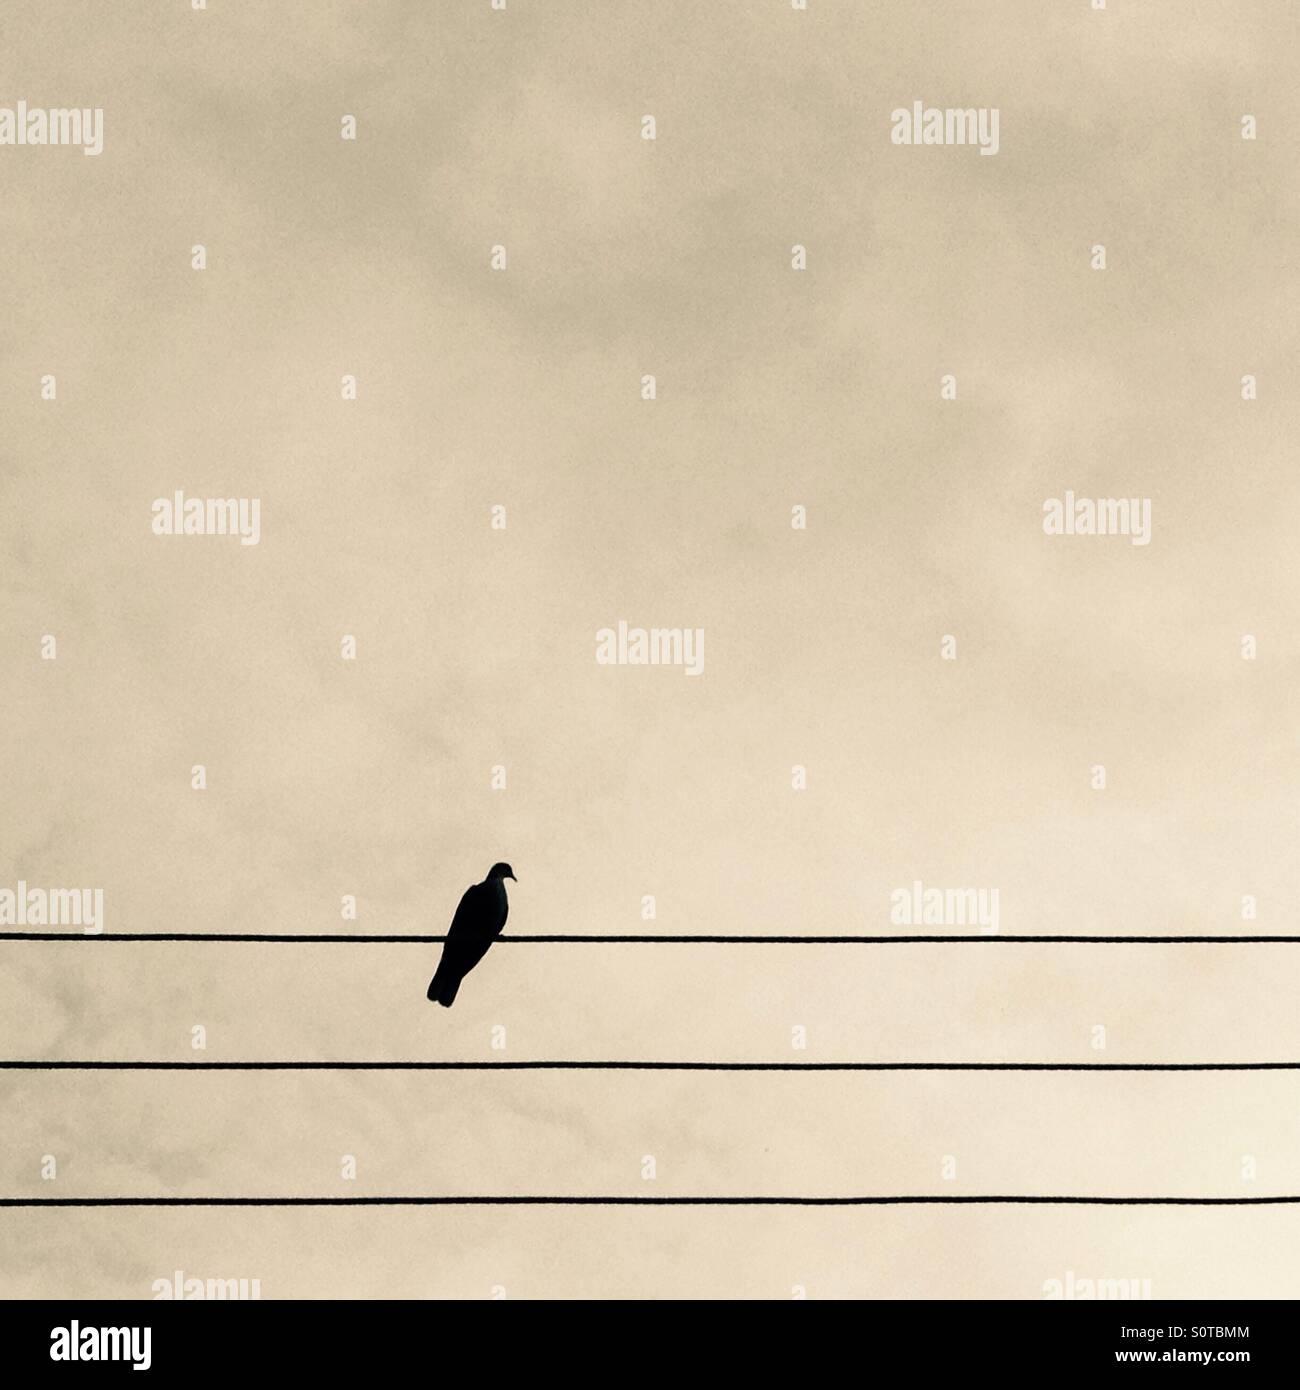 Bird Sitting On Telephone Wire Stock Photos & Bird Sitting On ...